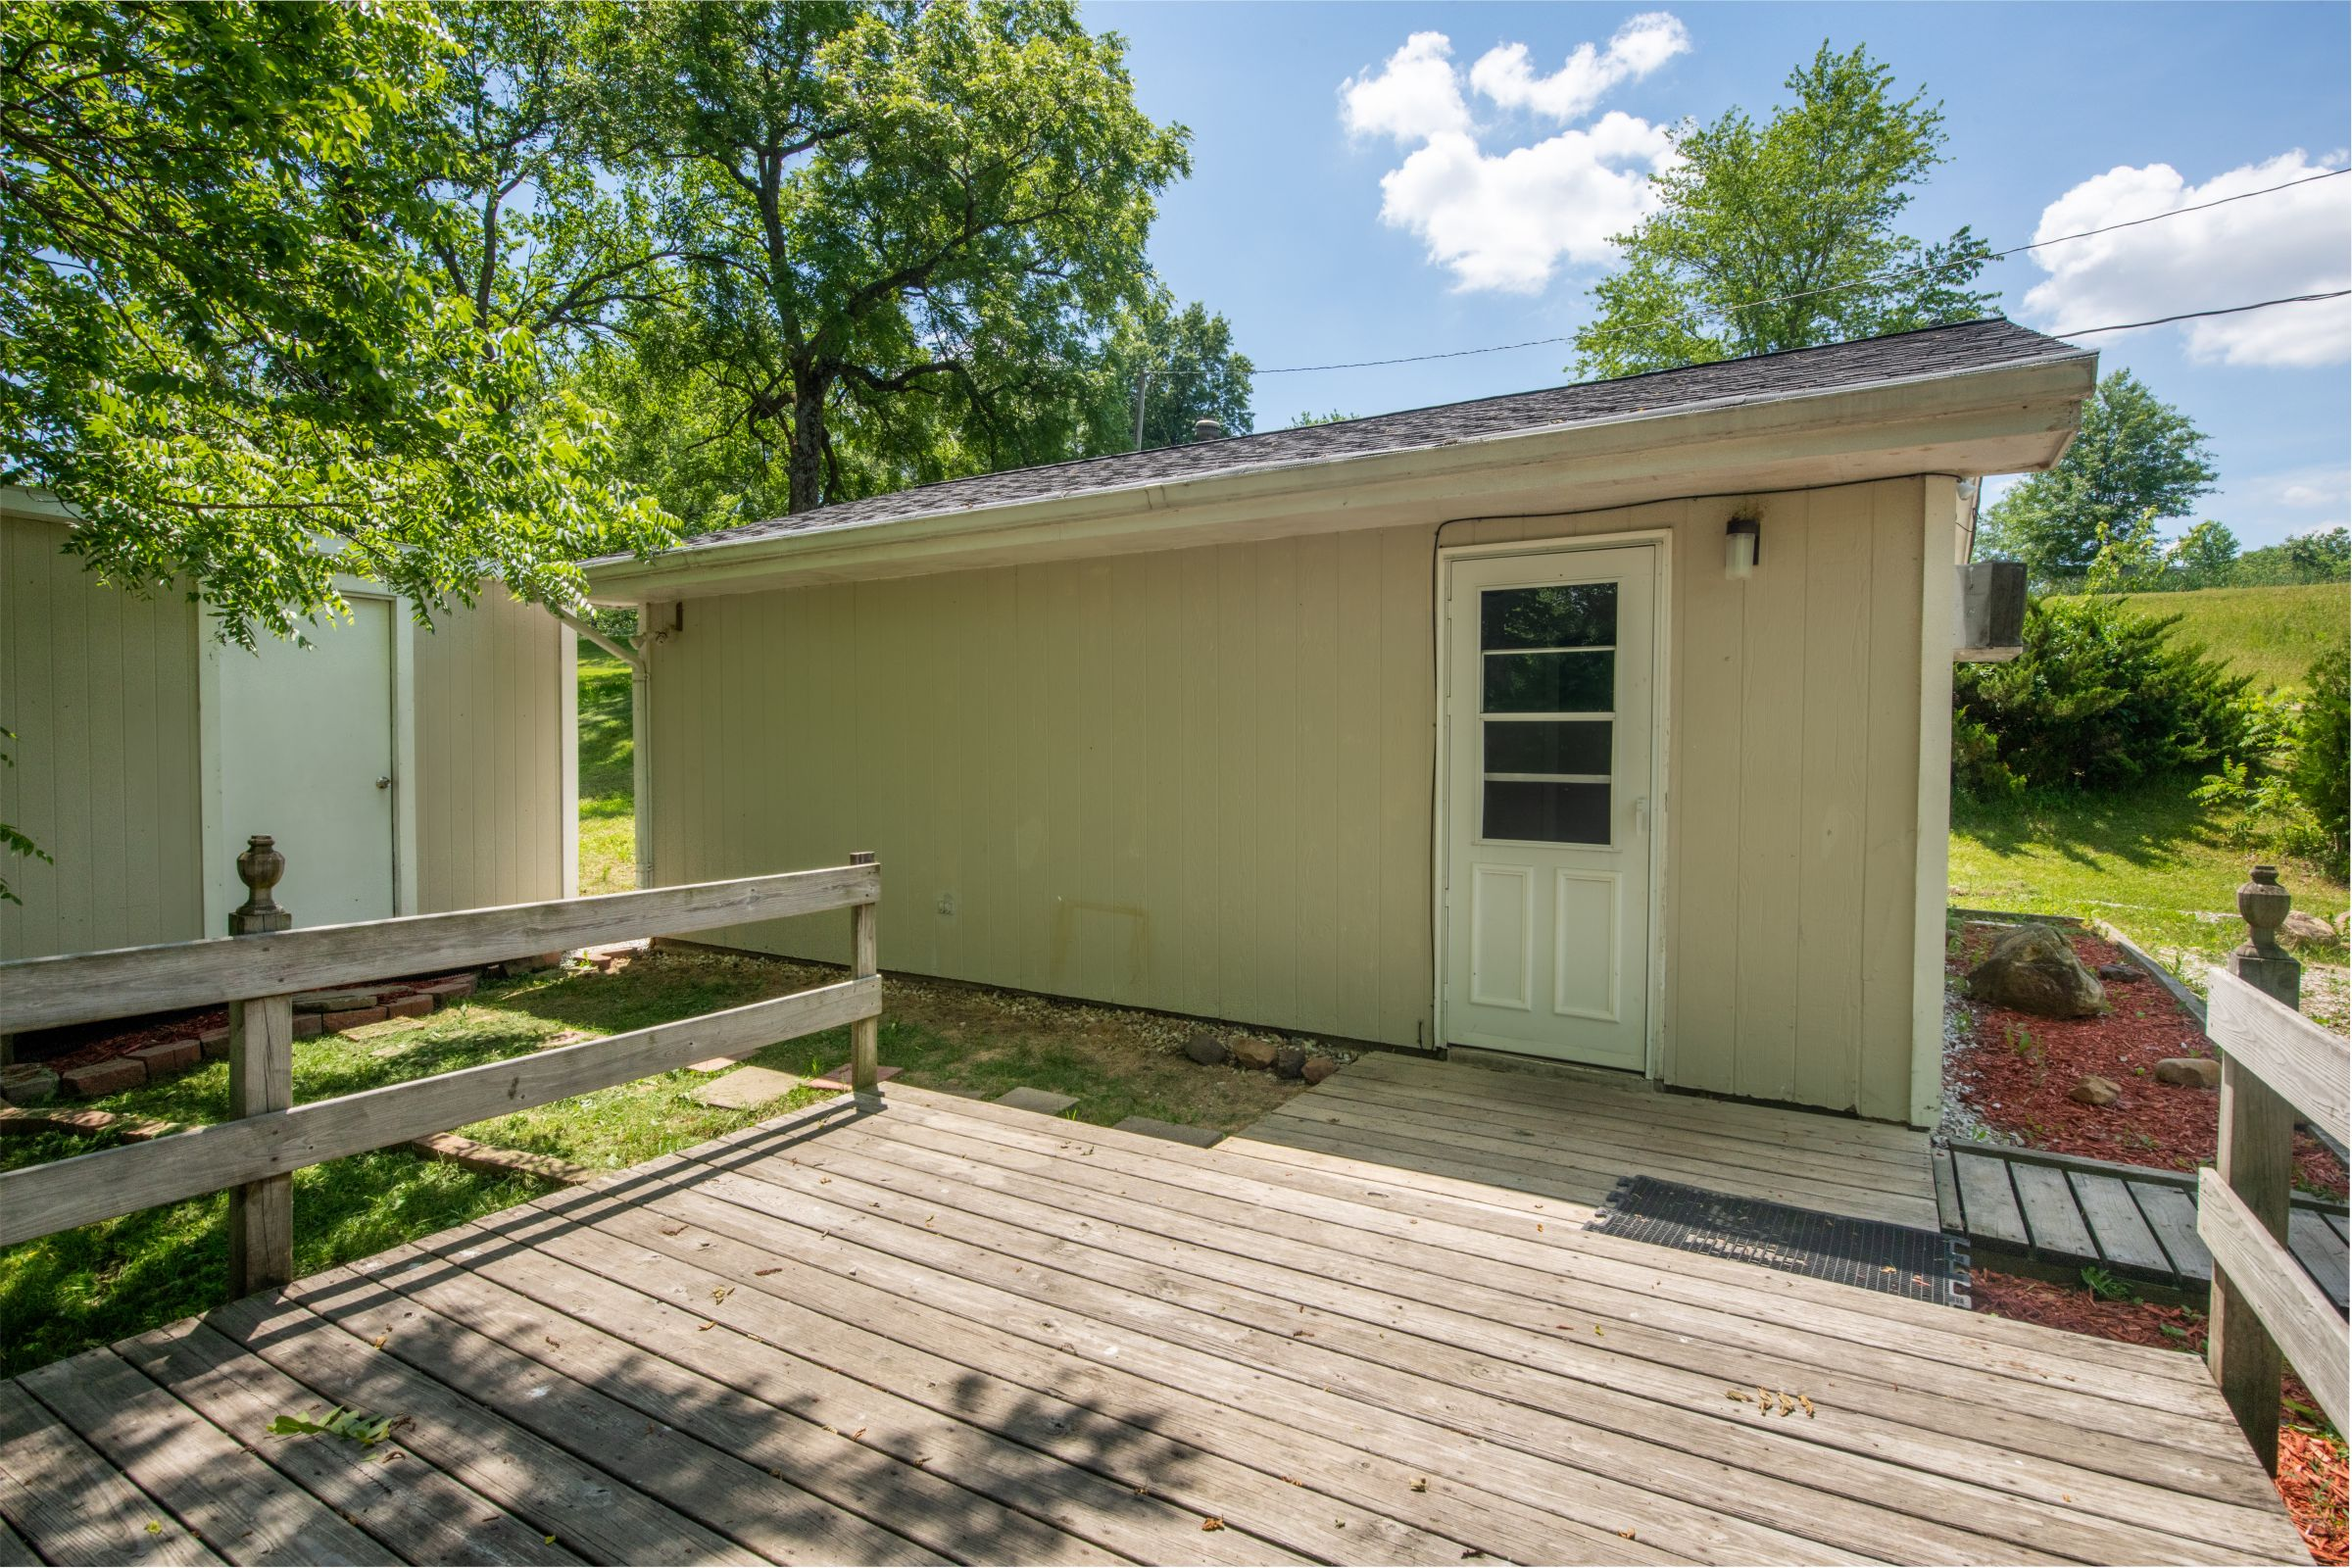 residential-warren-county-iowa-2-acres-listing-number-15576-2-2021-06-11-201317.jpg